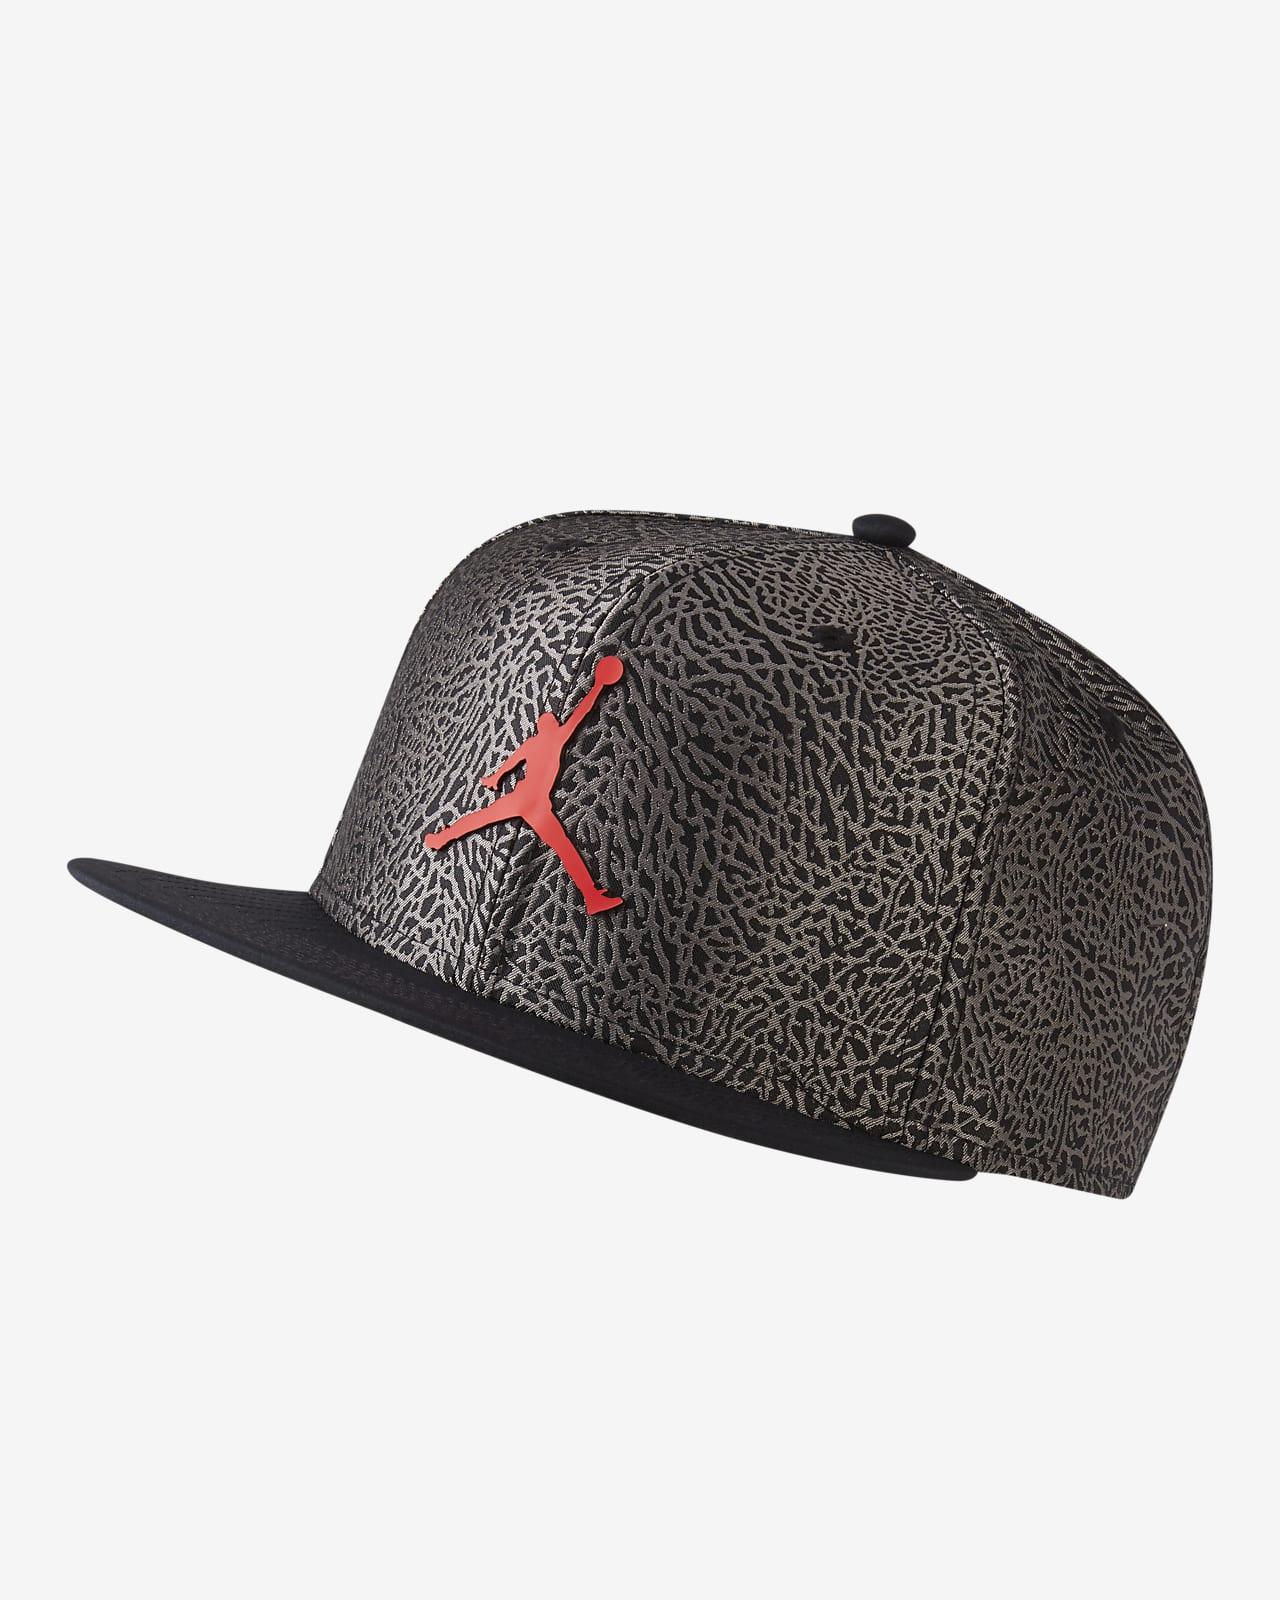 Jordan Pro Snapback Hat